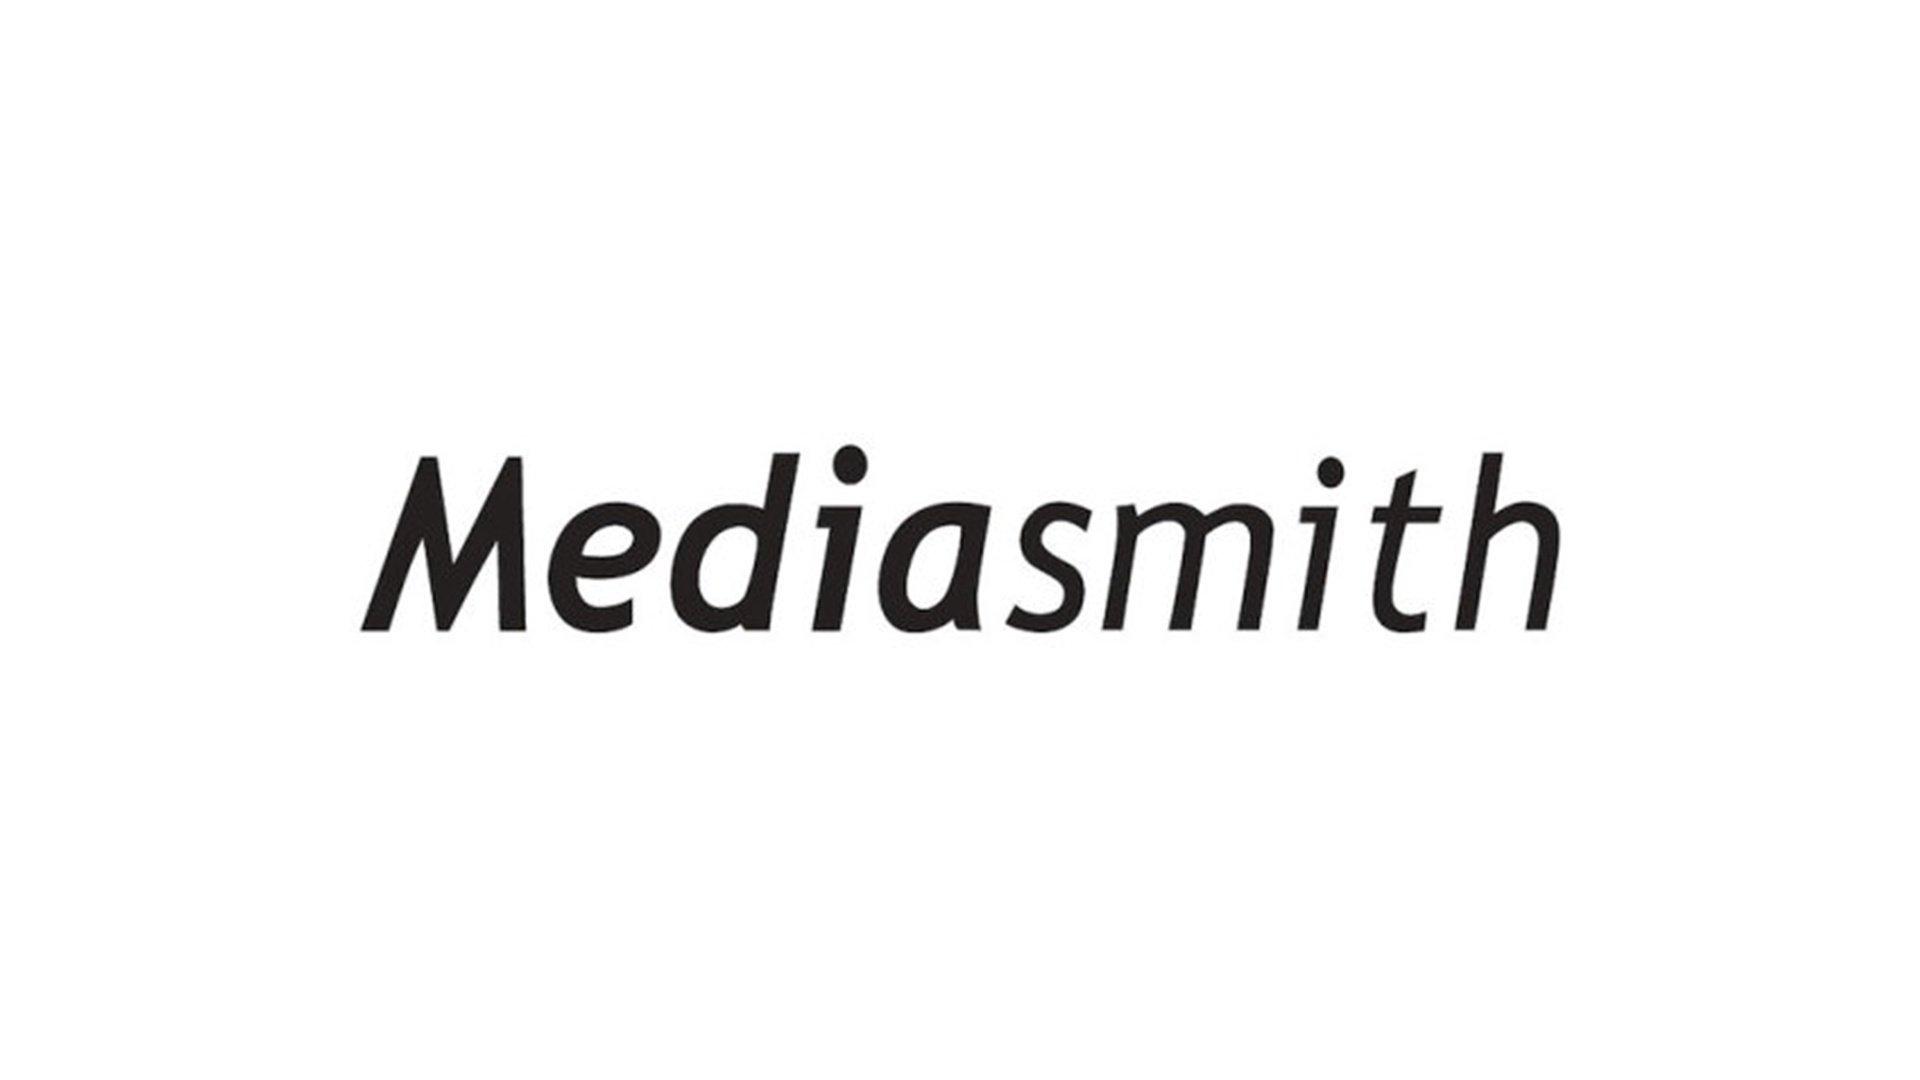 Content Marketing All-Stars Q&A: David L. Smith of Mediasmith